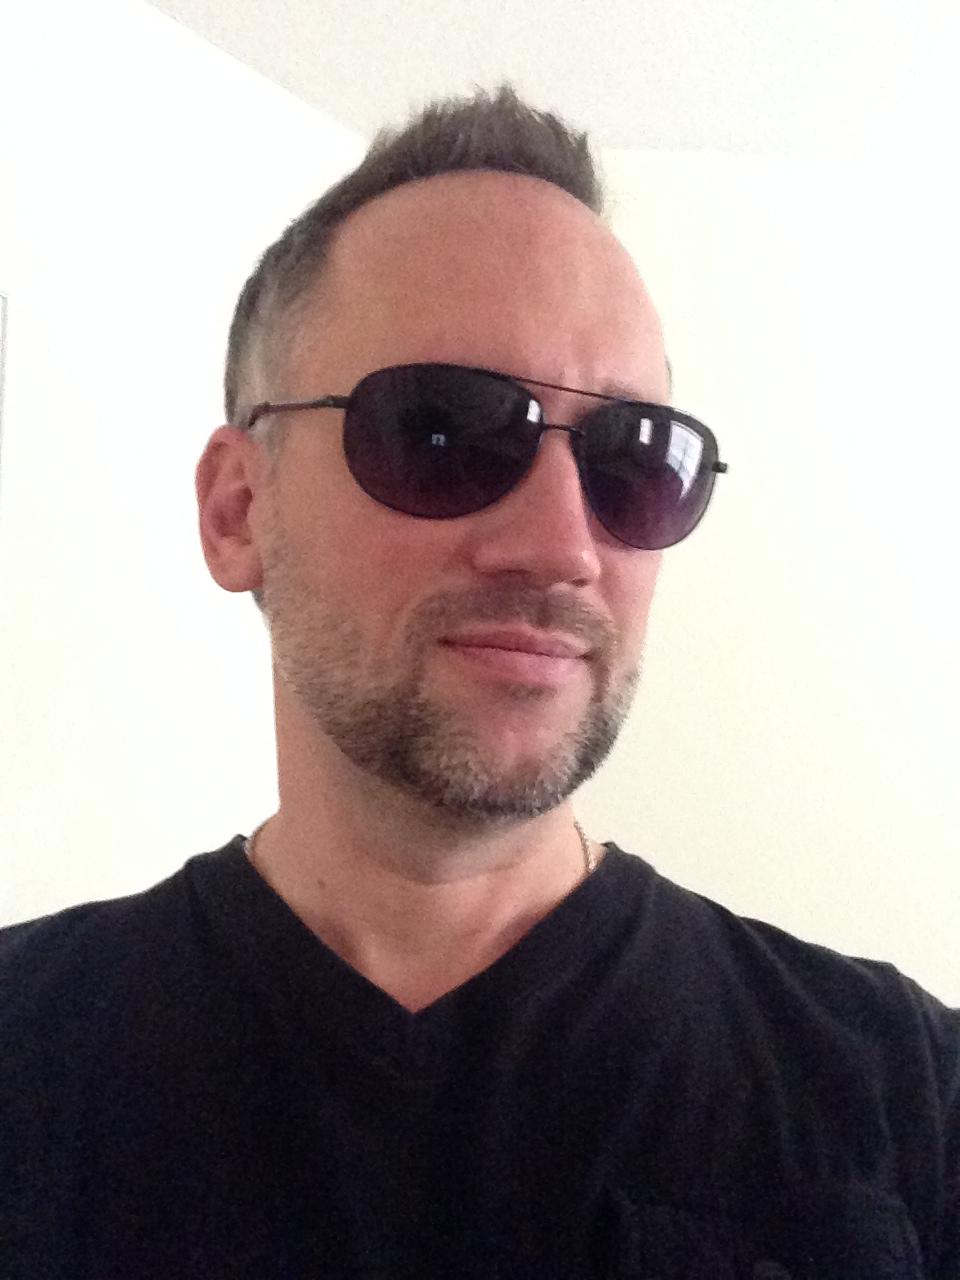 Keith Klevenski